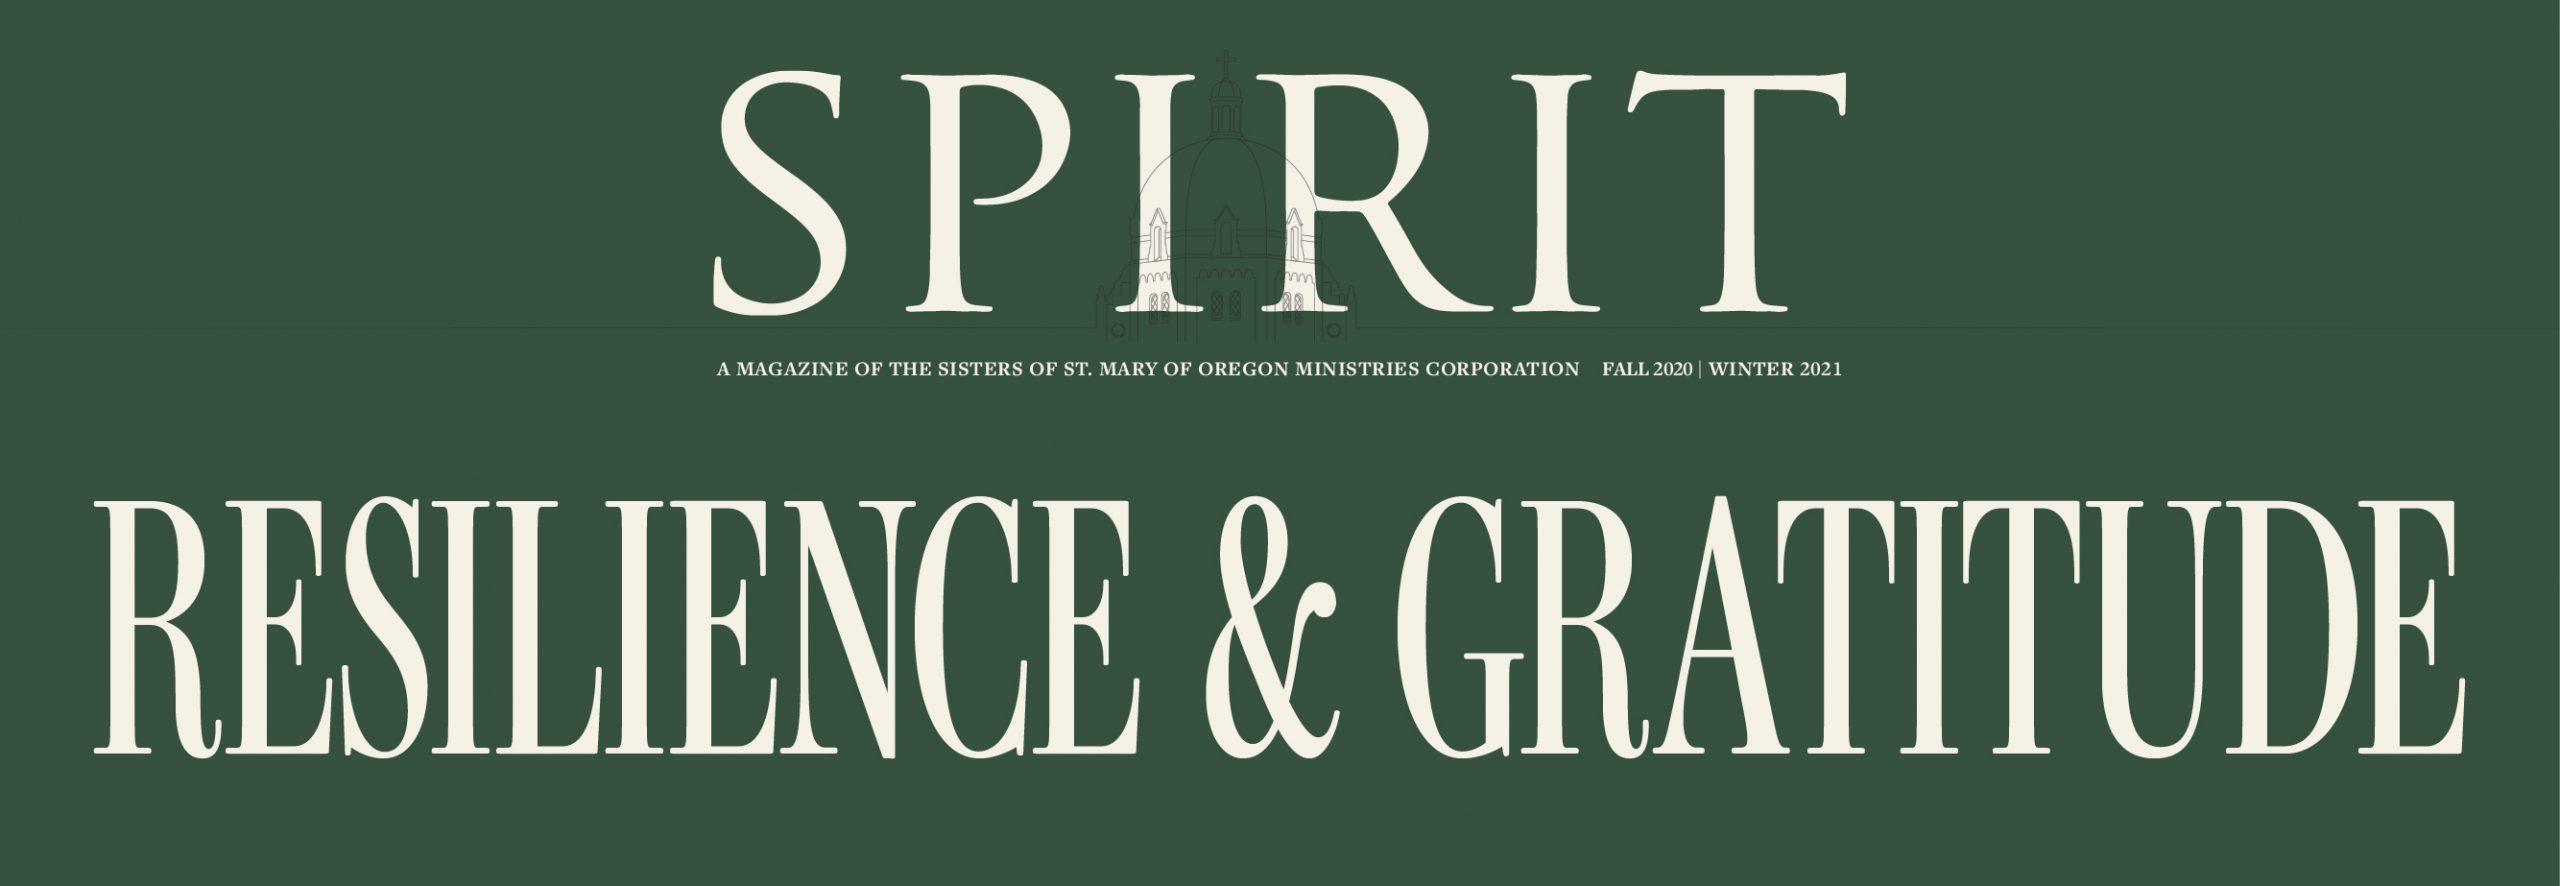 Spirit Magazine 2020